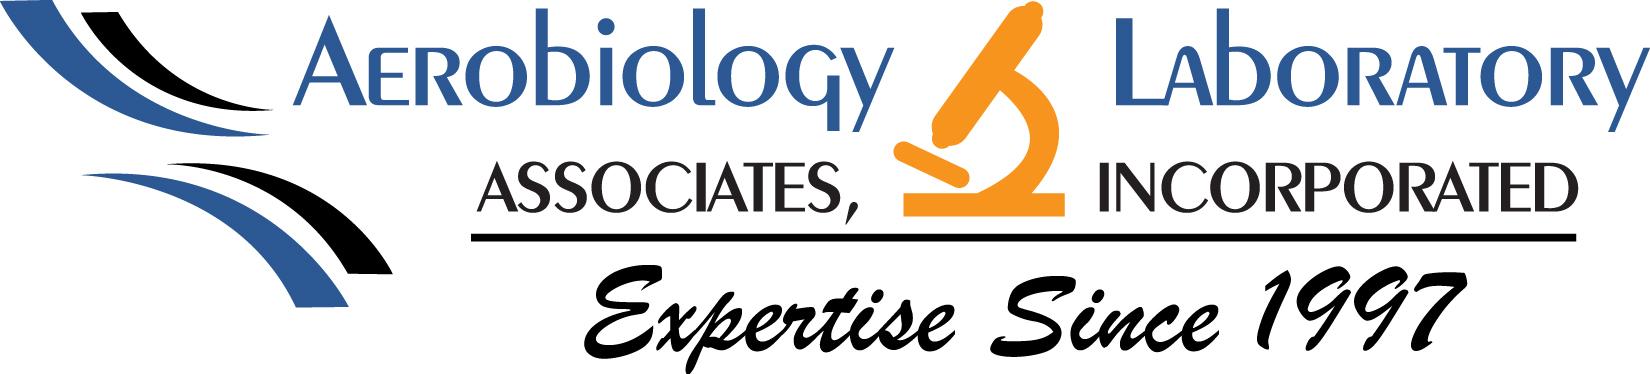 Aerobiology Laboratory Associates Inc Purchases Pure